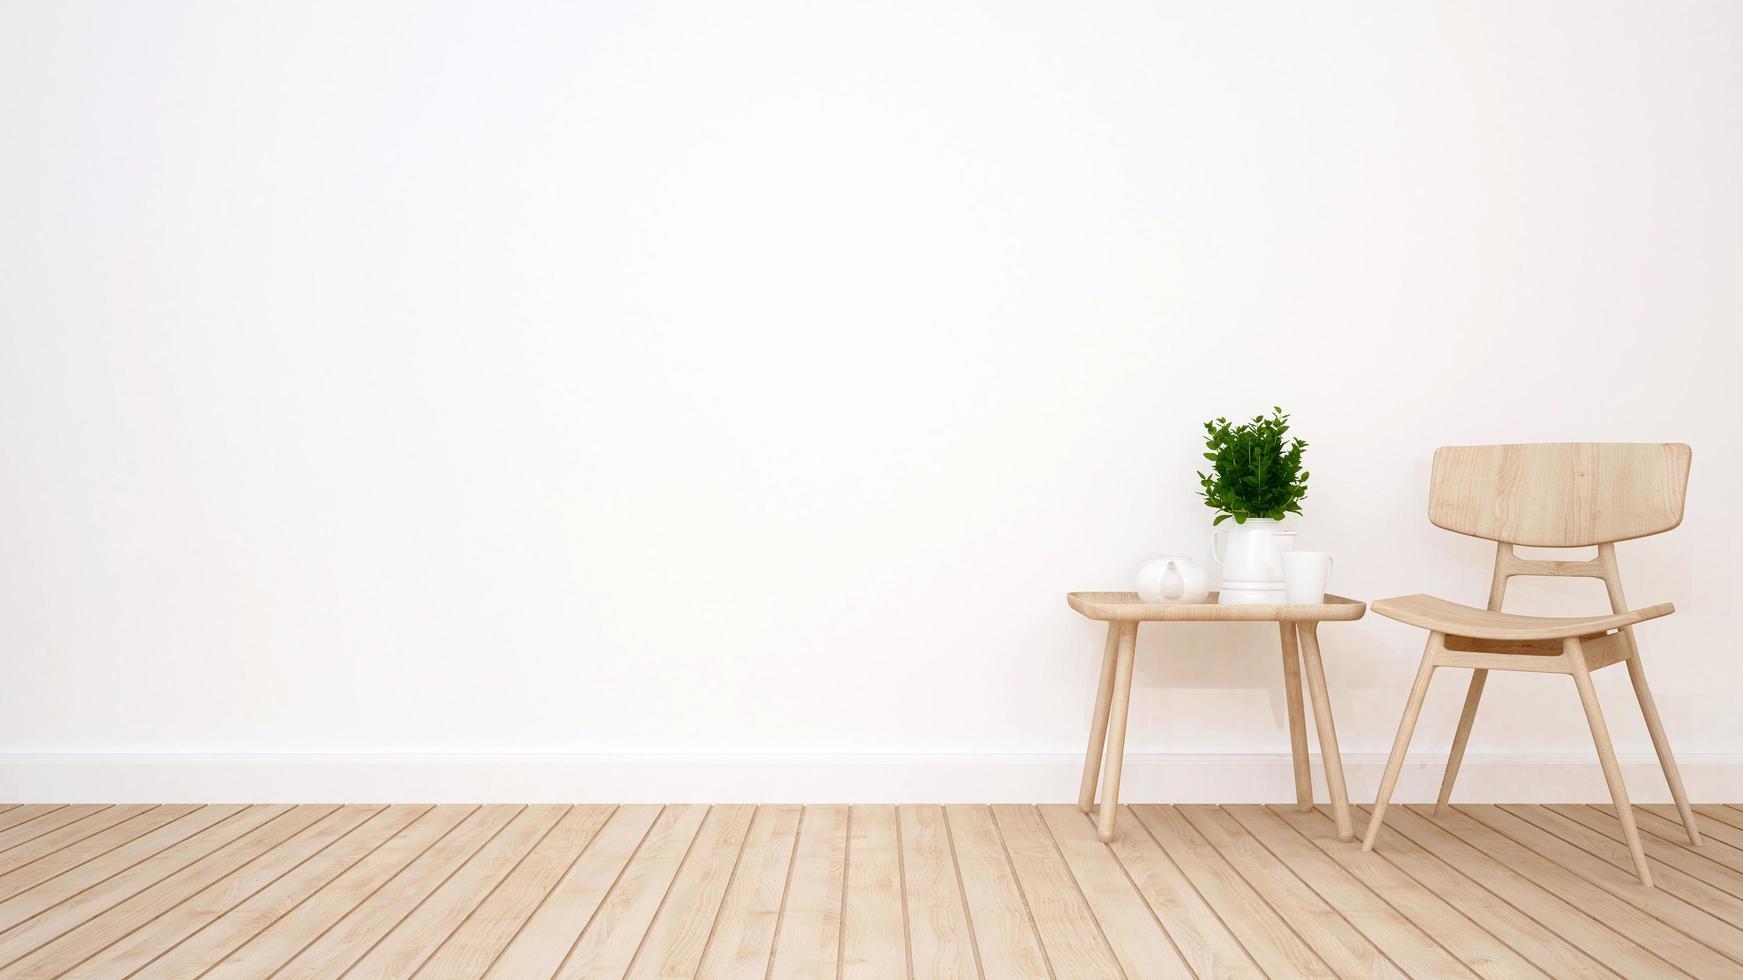 woonkamer in koffiebar of appartement foto